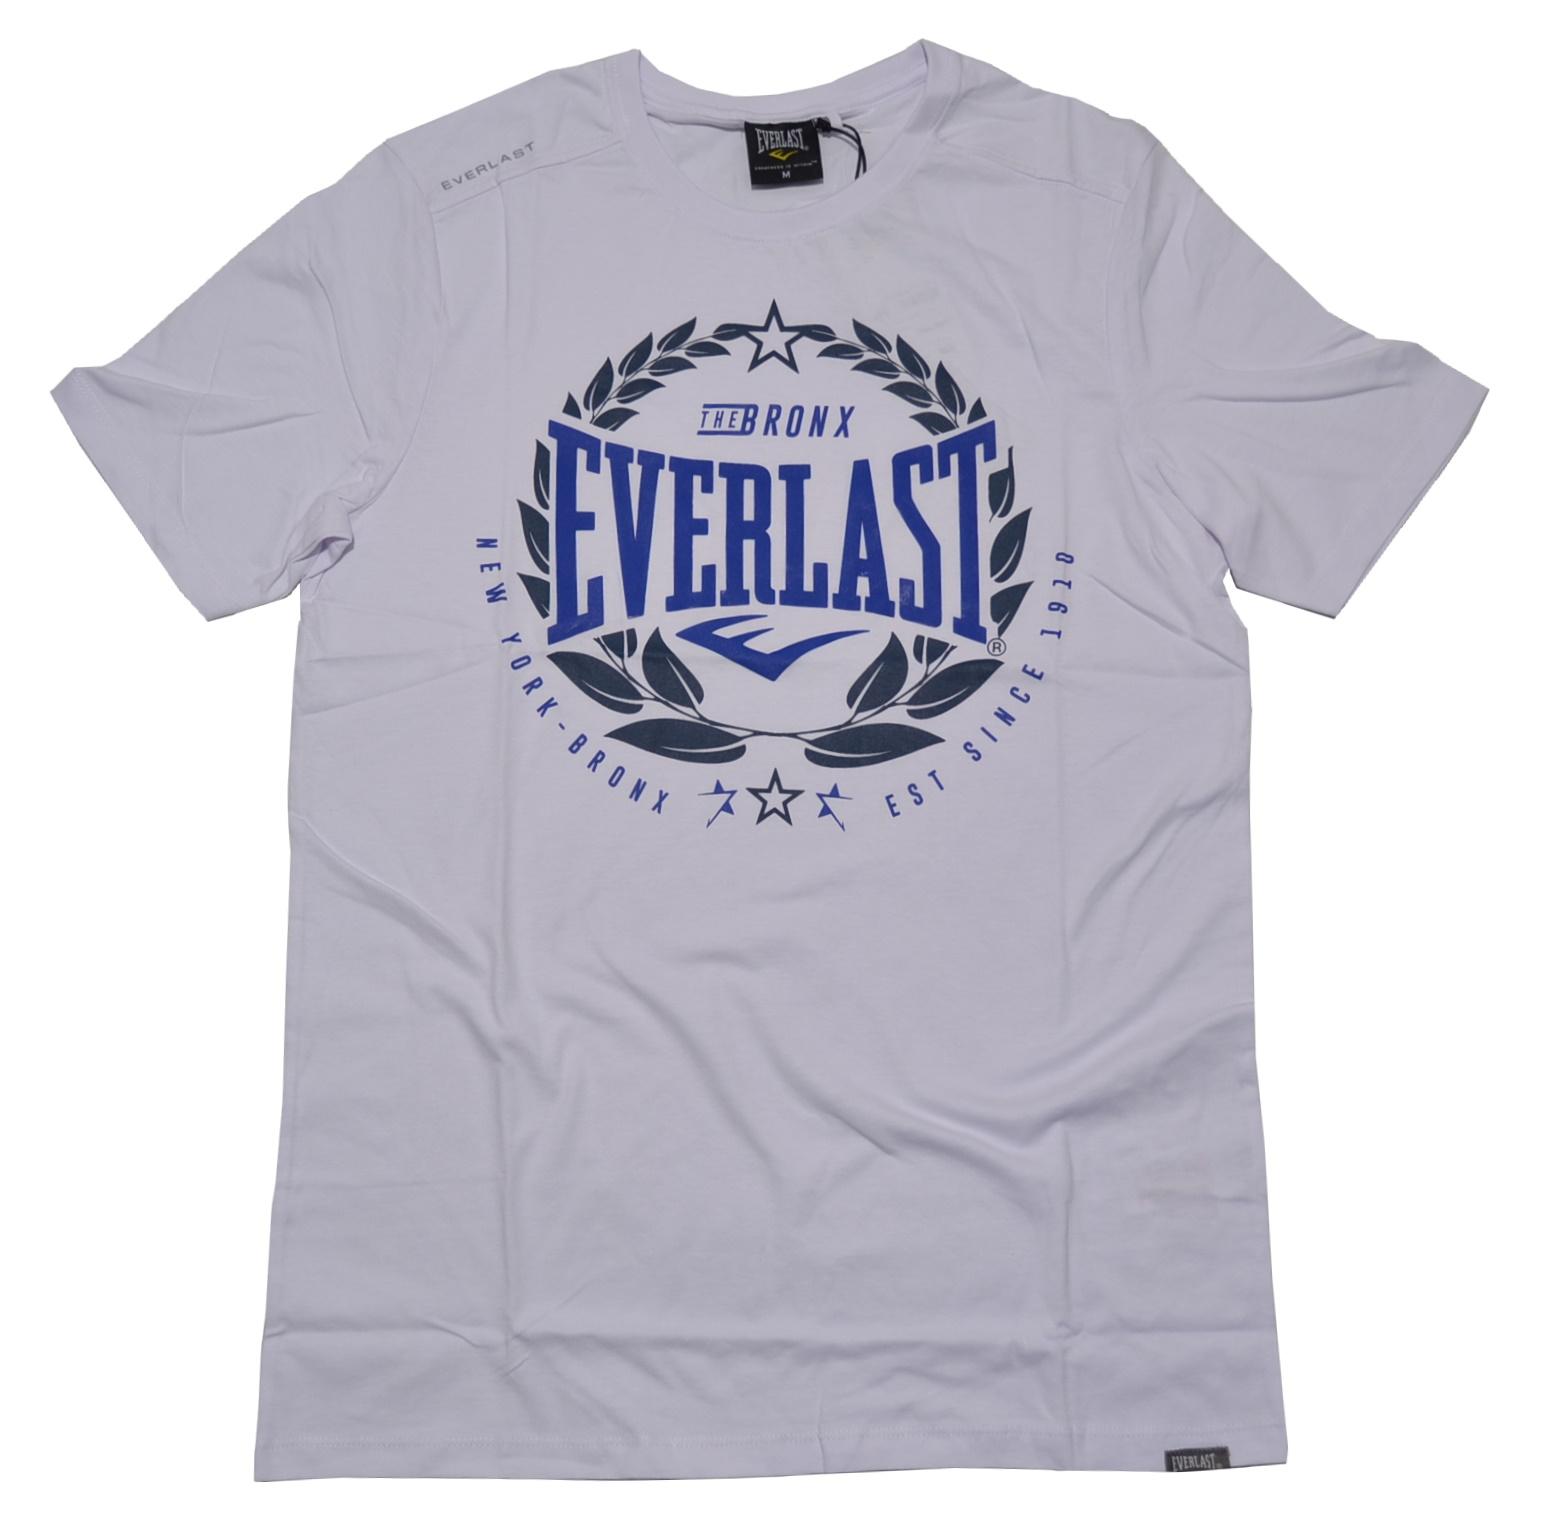 26a2e05395dd99 Everlast T-Shirt Laurel - Everlast T-Shirts - Ostzone Shop ...